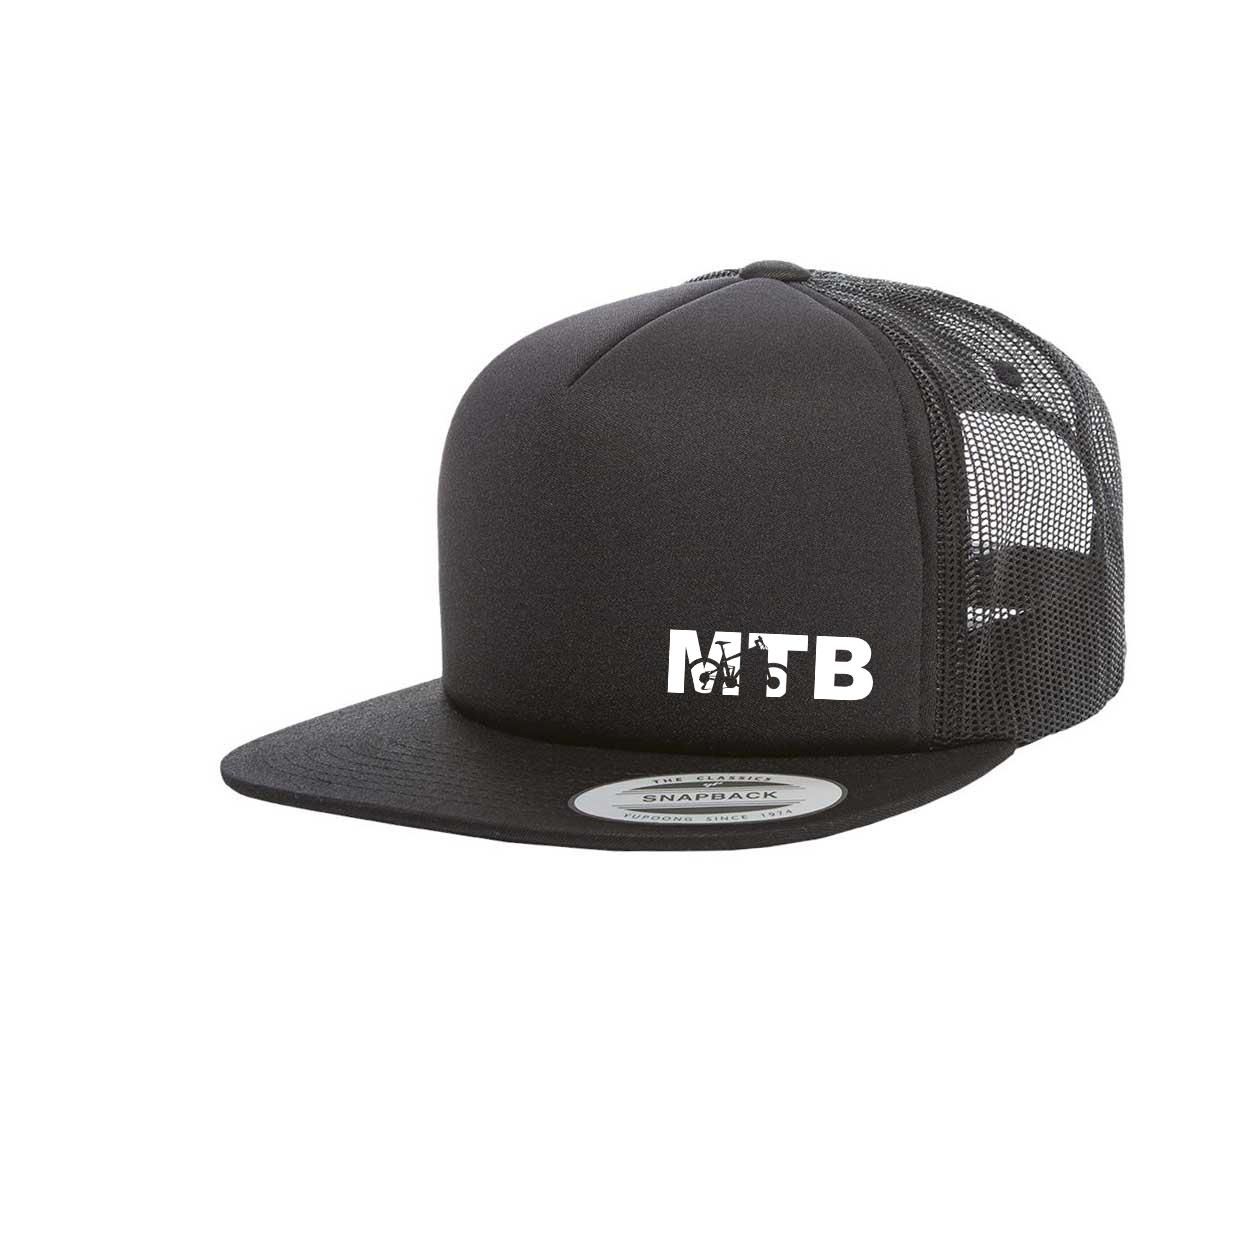 MTB Mountain Bike Logo Night Out Premium Foam Flat Brim Snapback Hat Black (White Logo)